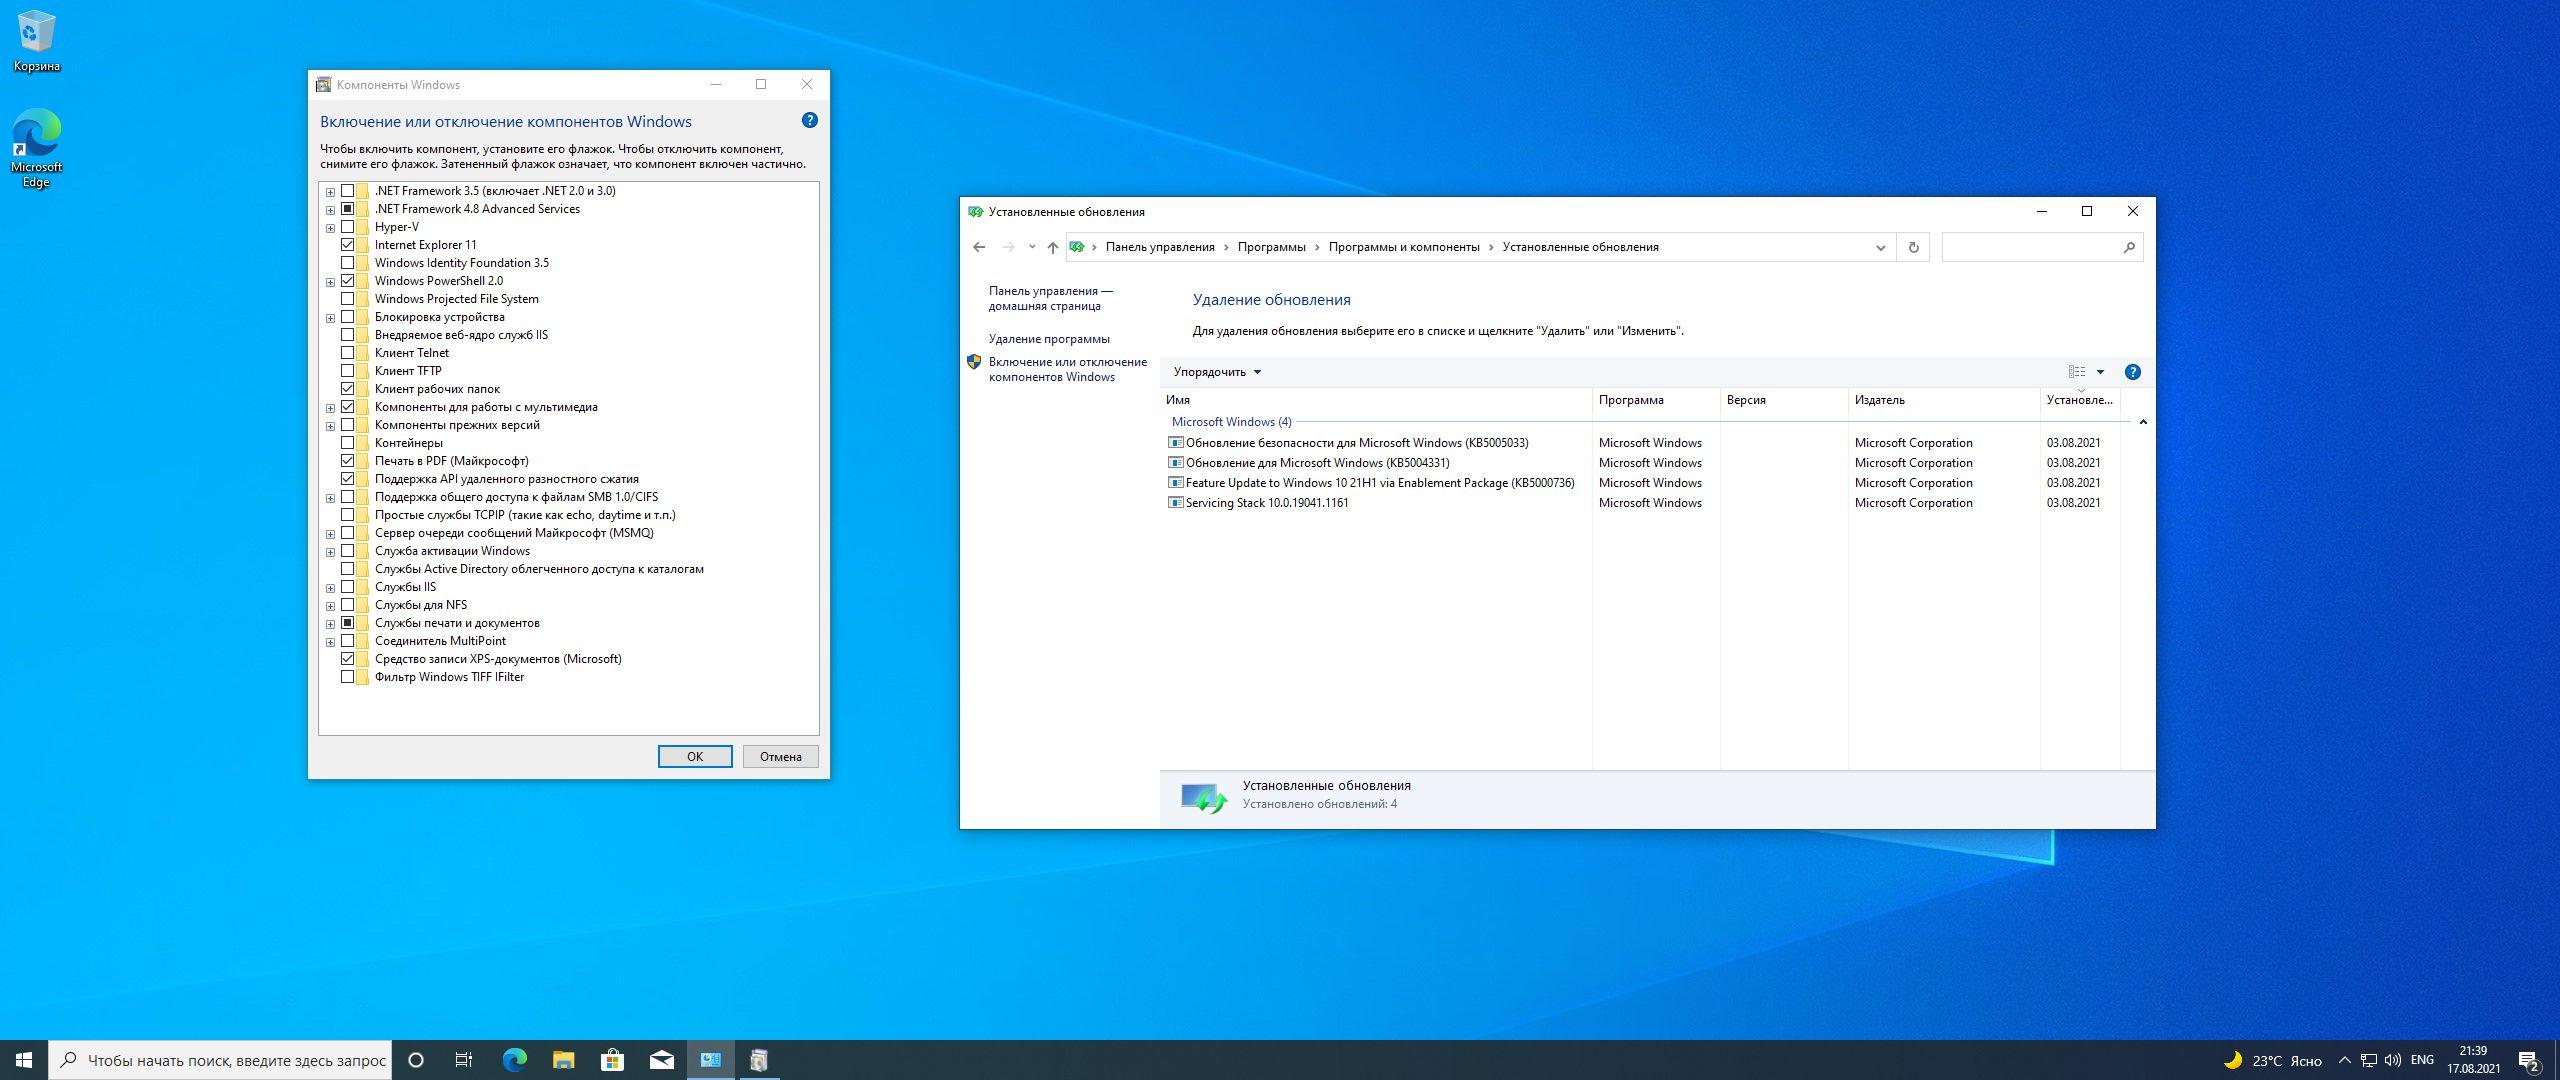 Windows 10.0.19043.1165 Version 21H1 (Updated August 2021) - Оригинальные образы от Microsoft MSDN